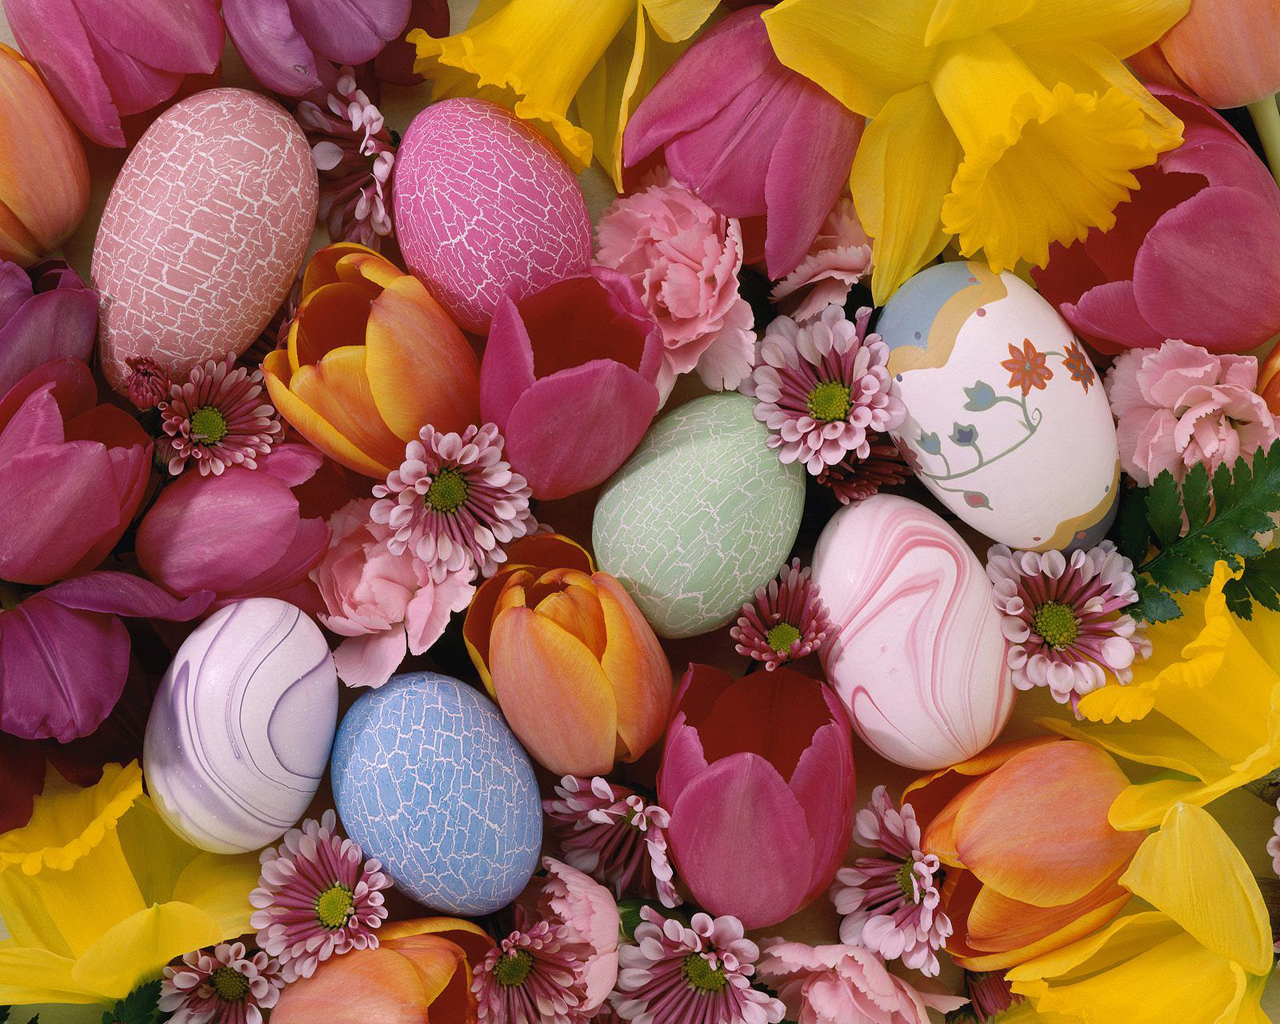 Farbanje jaja kao umetnost Easter_egg_flower_1280x1024